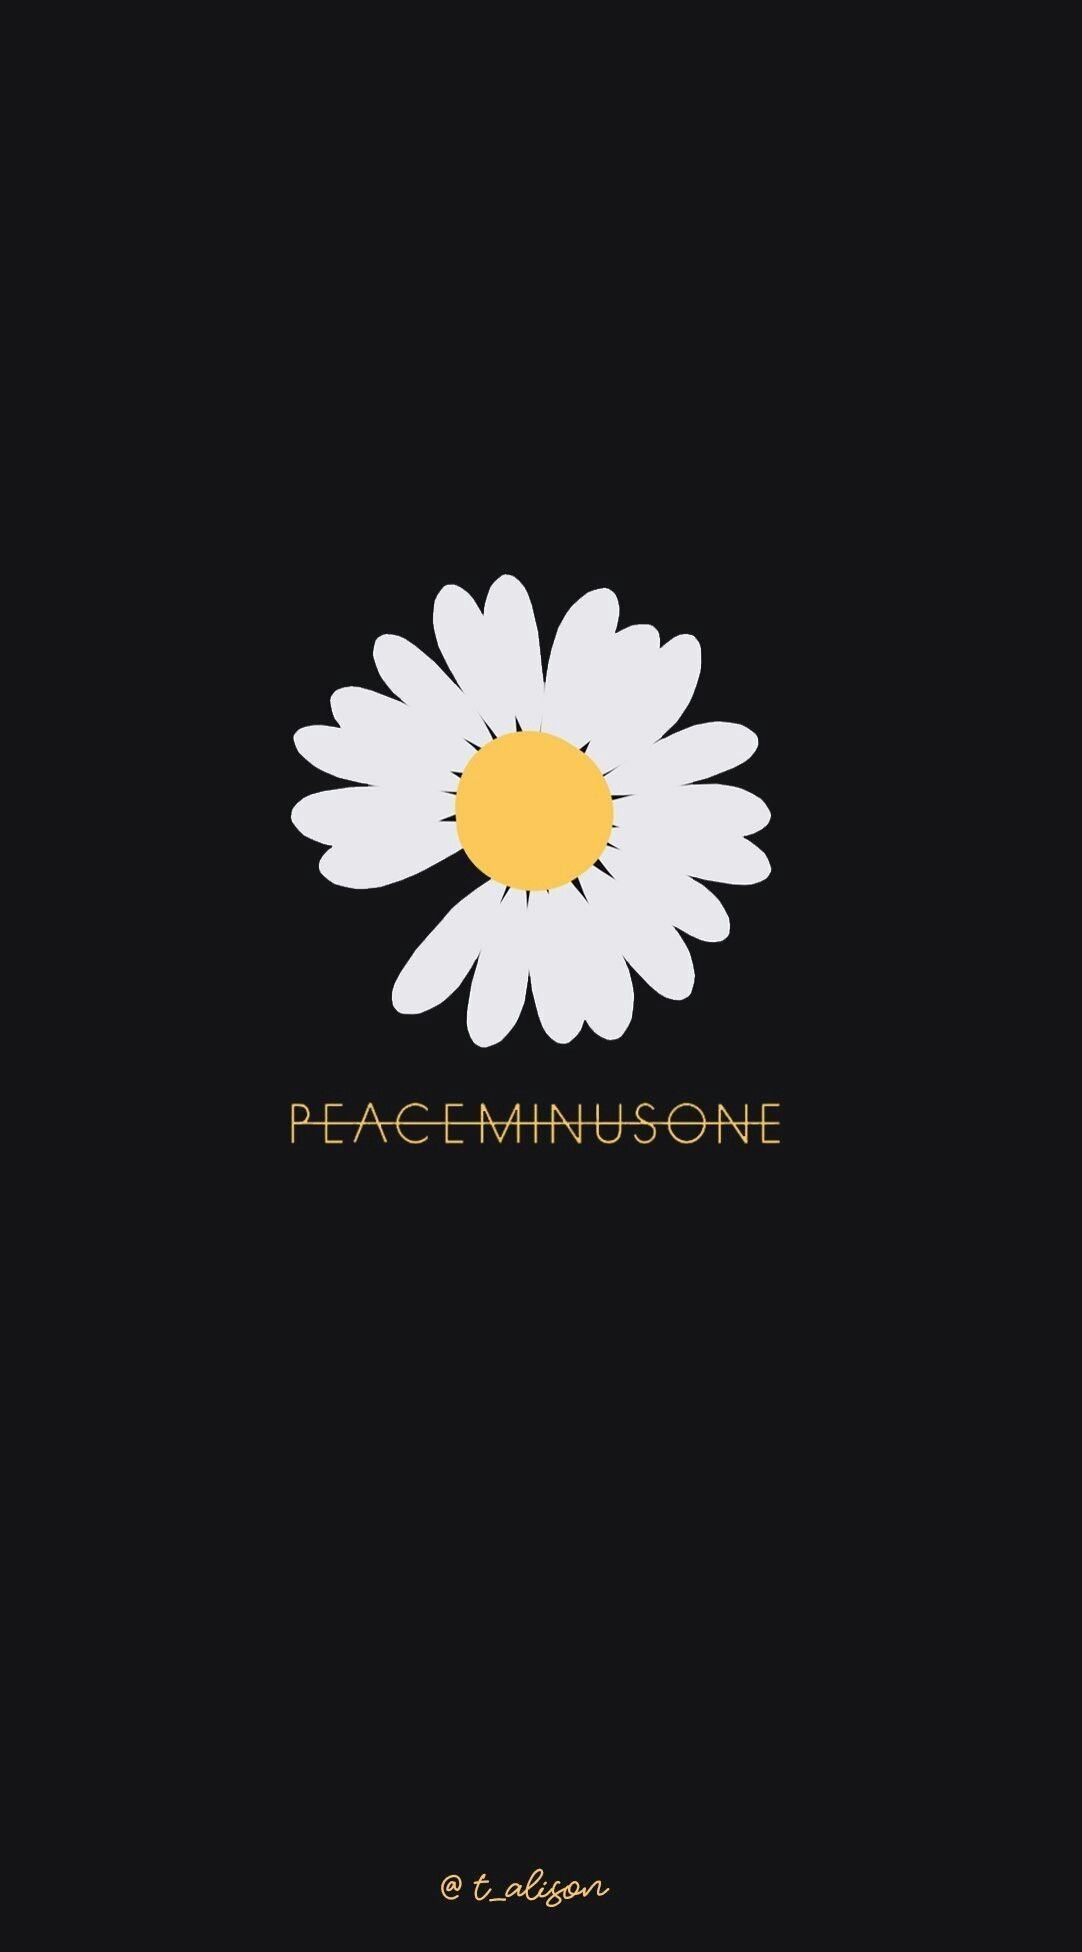 Peaceminusone Wallpapers Top Free Peaceminusone